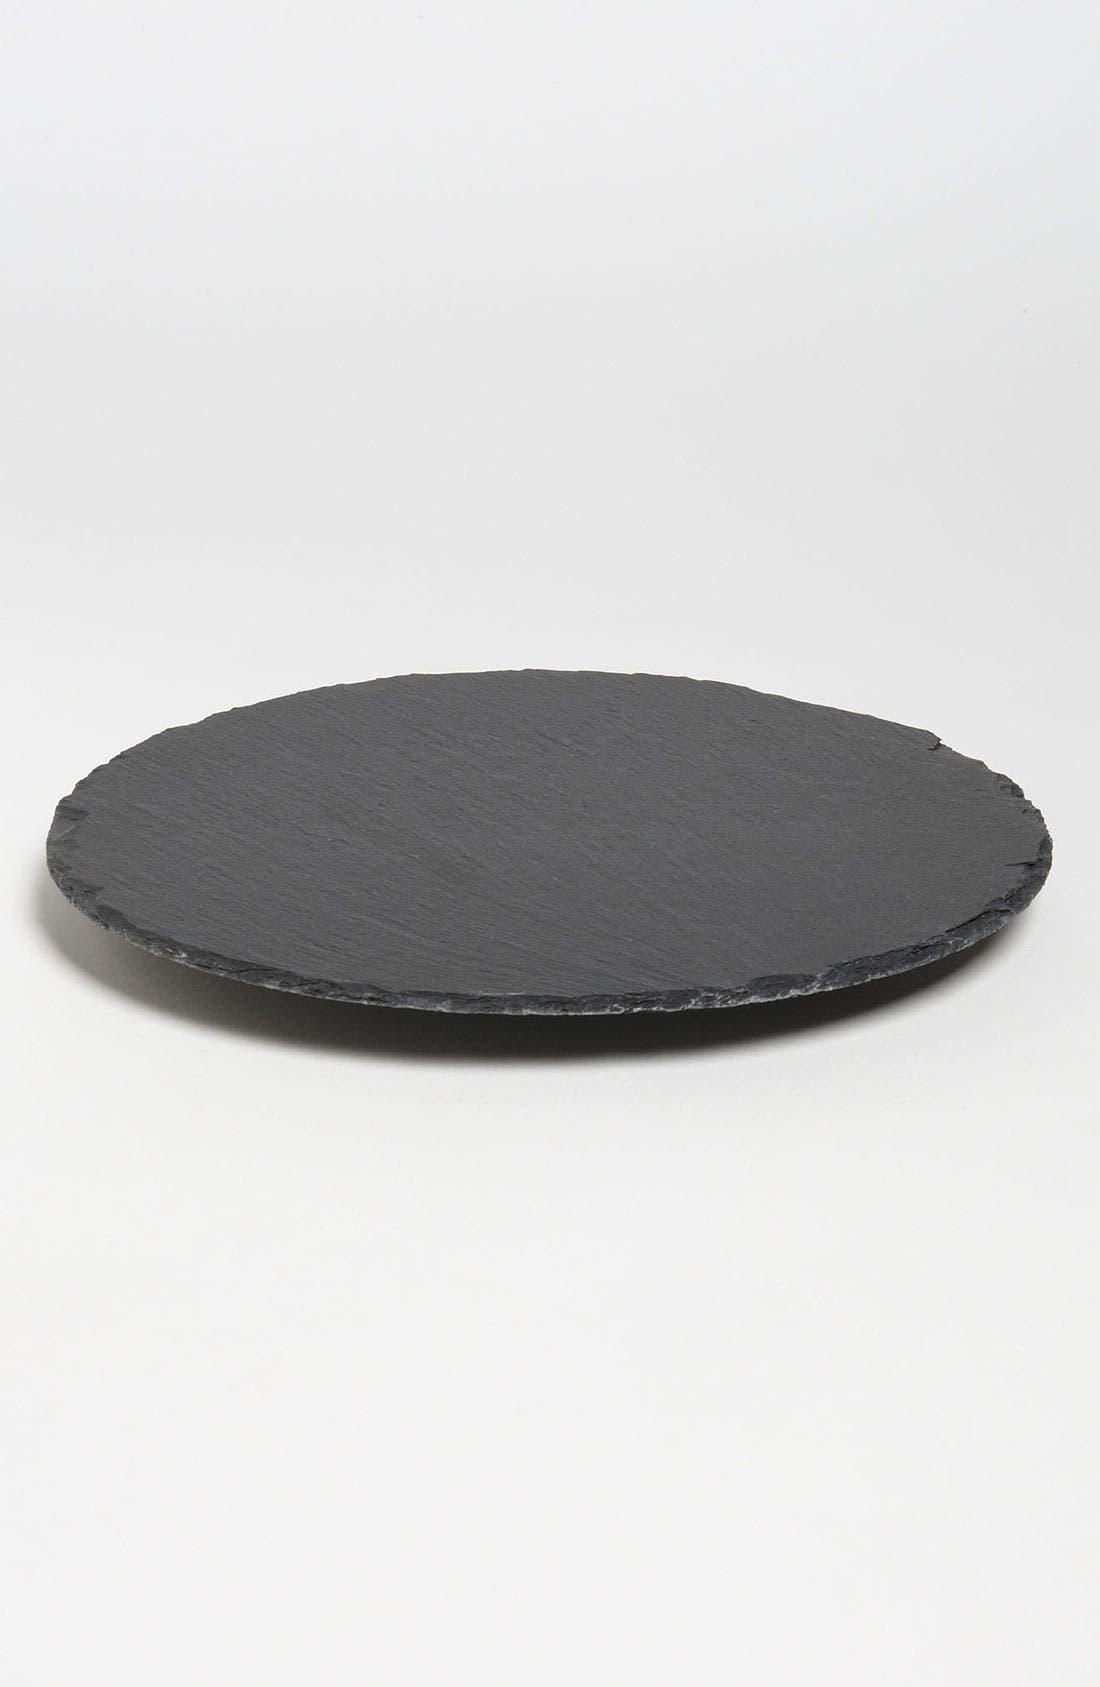 Main Image - 'Monaco' Lazy Susan Slate Cheese Board